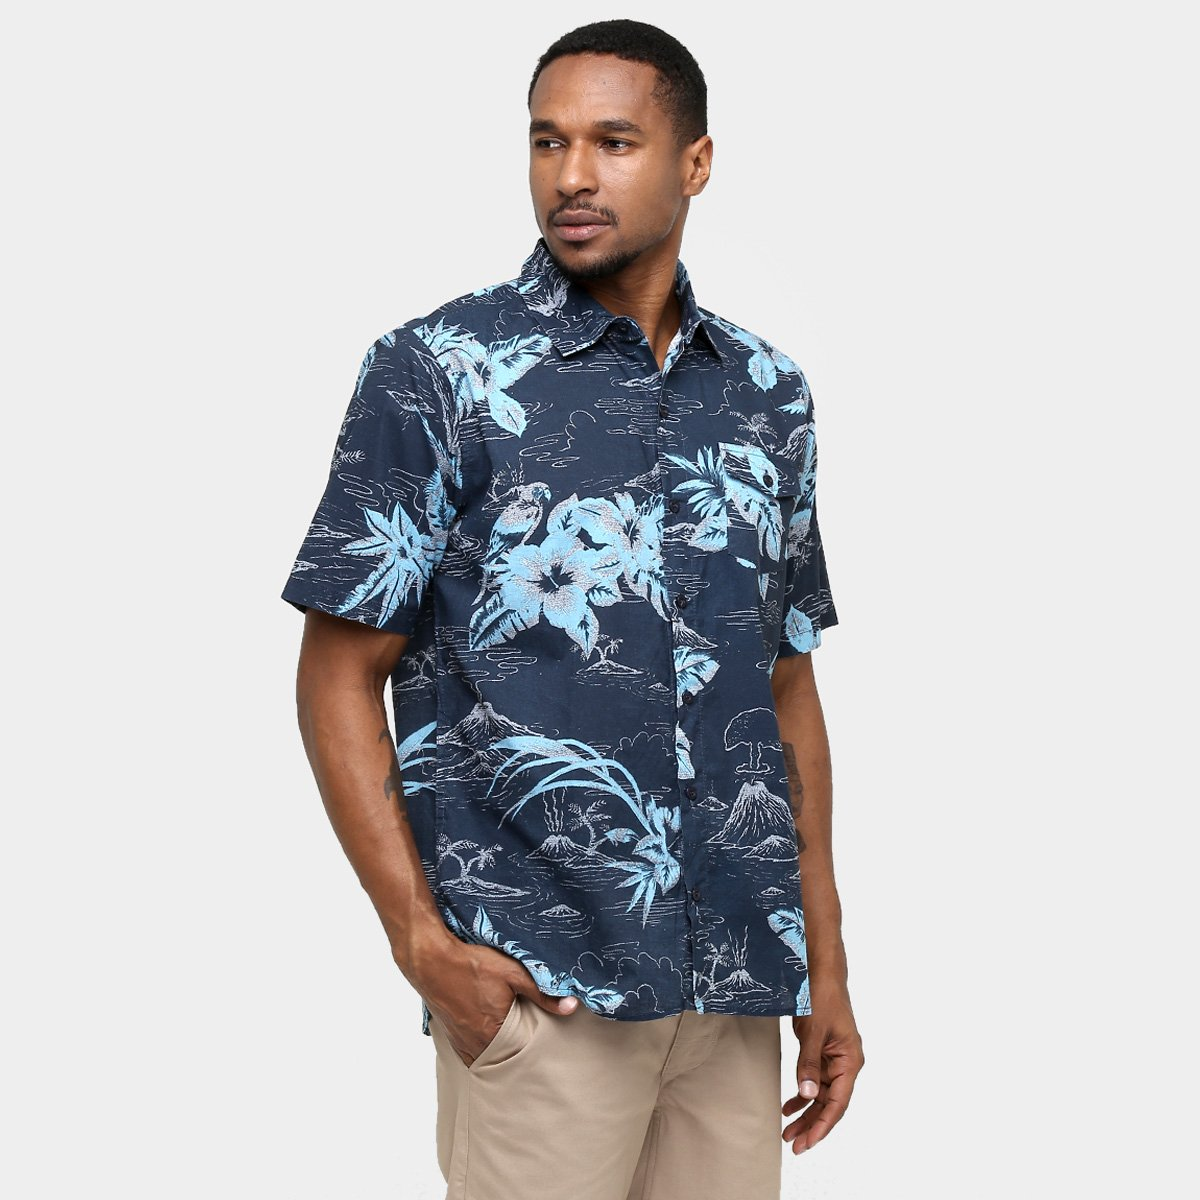 Camisa Quiksilver Parrot - Compre Agora   Netshoes c26b006809